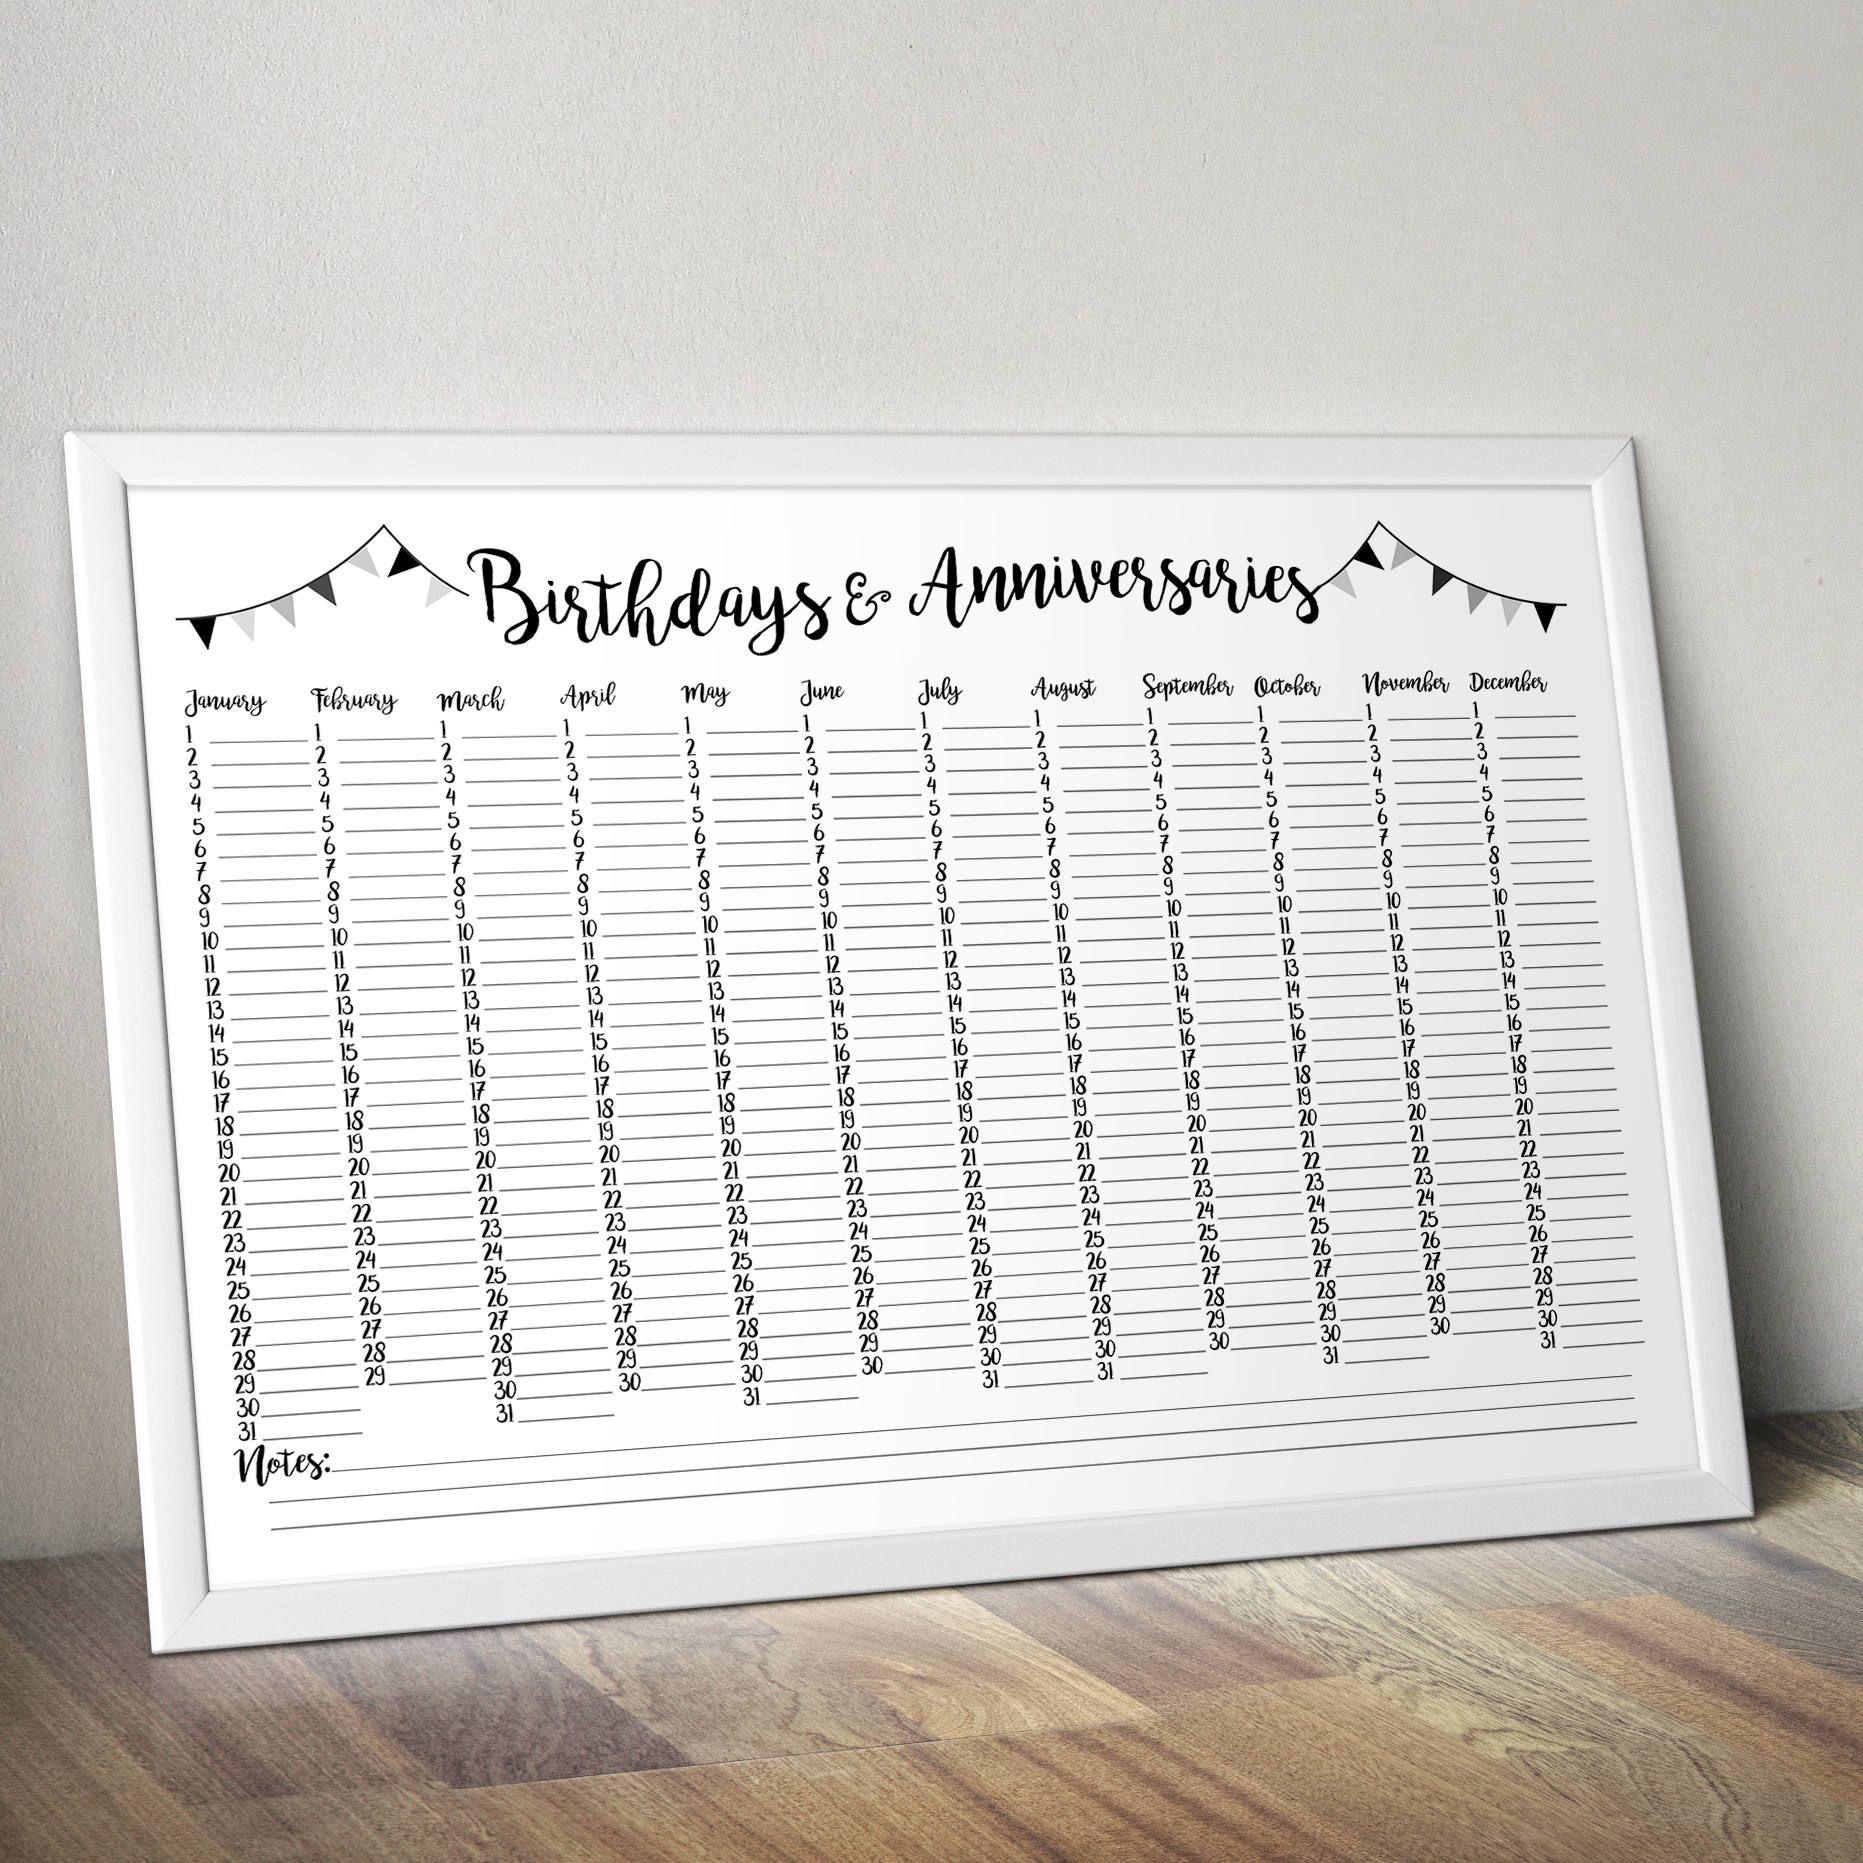 Birthday And Anniversary Calendar – Printable Perpetual